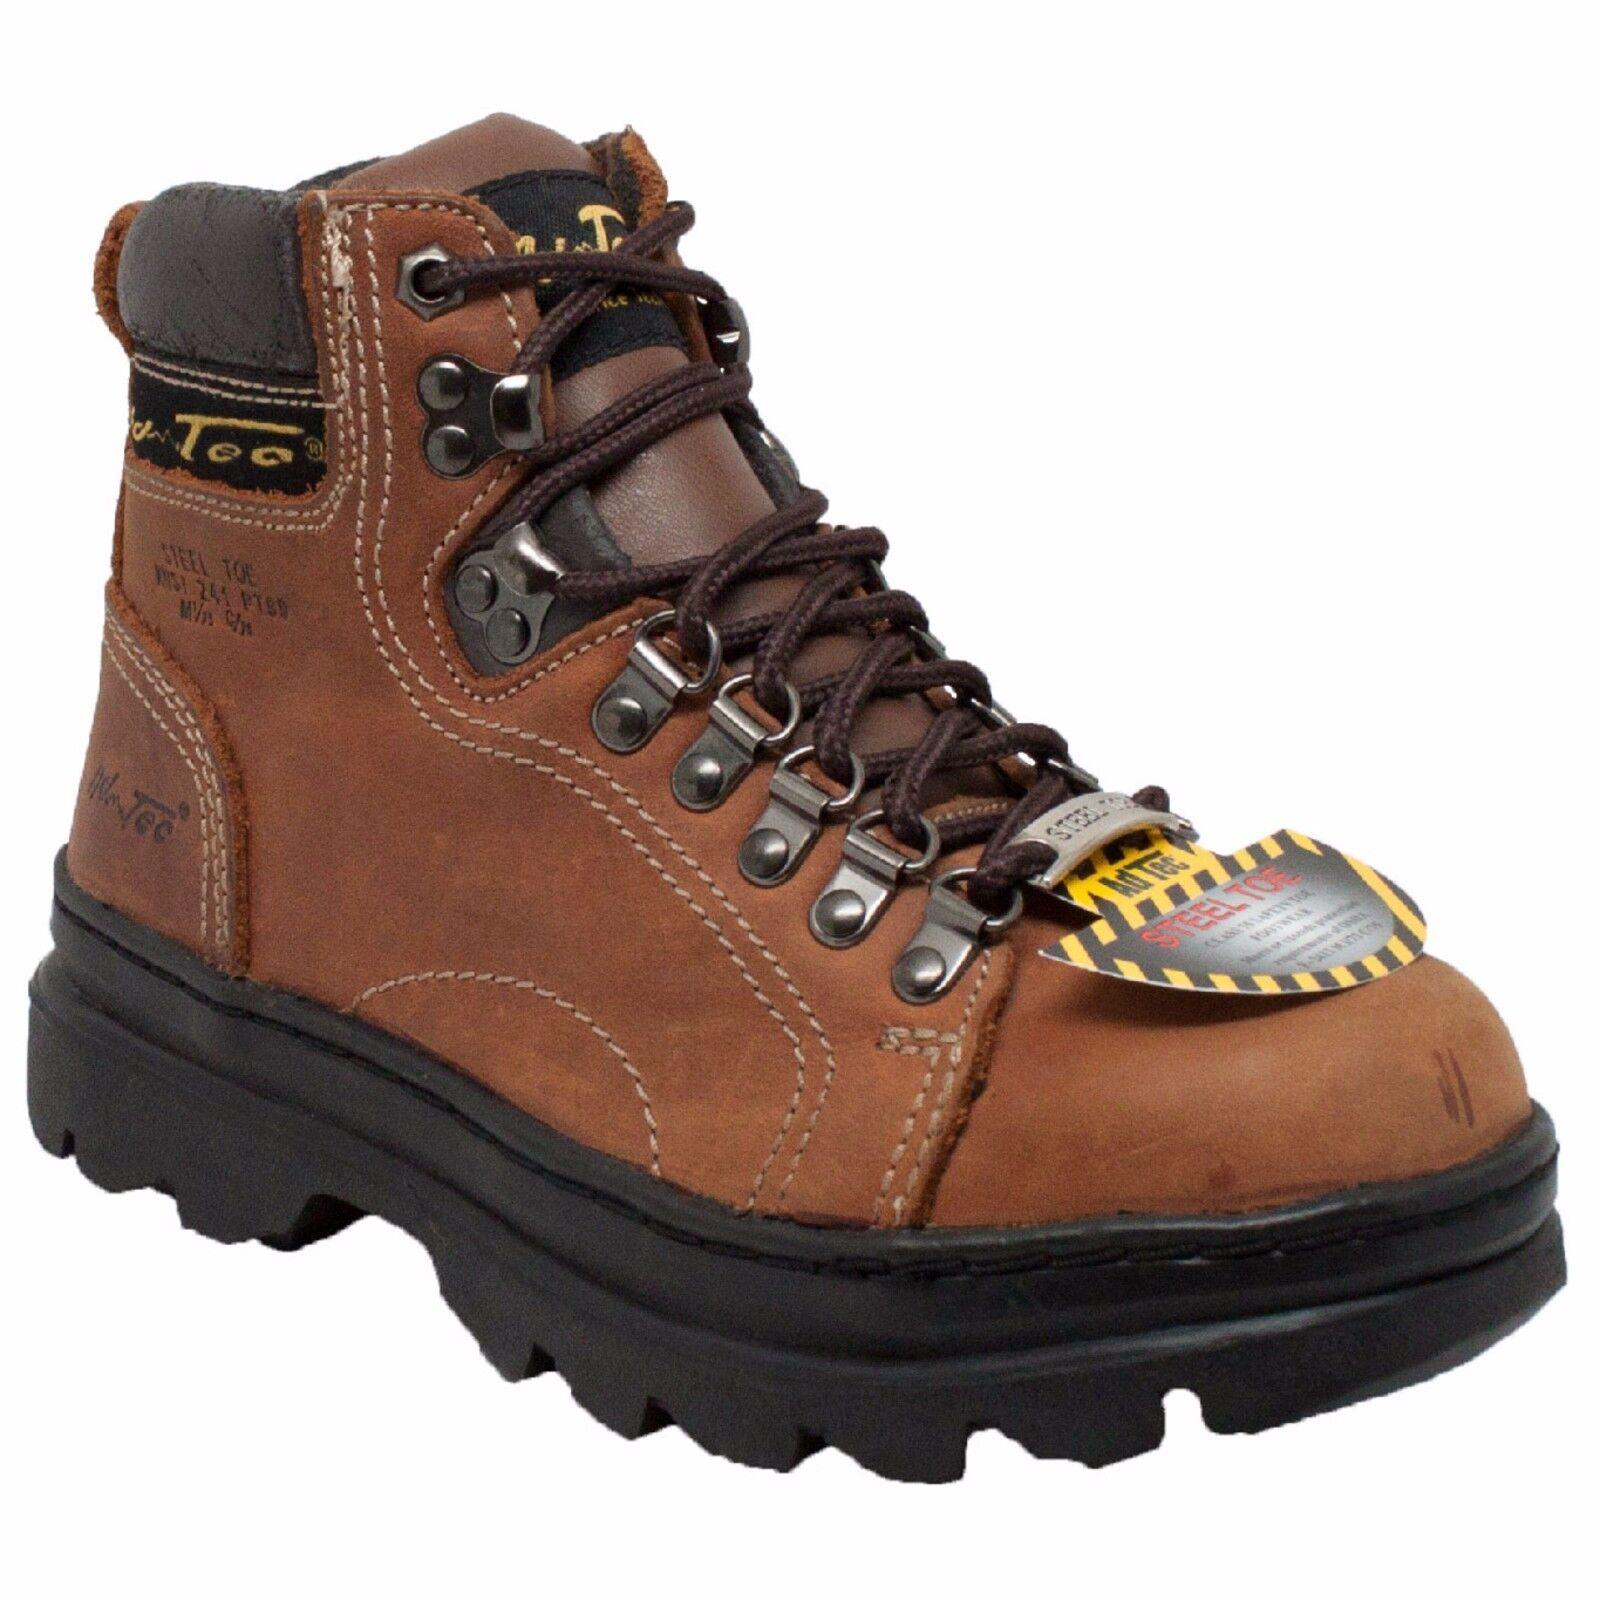 2977 AdTec, Brown, Women's 6'' Steel Toe Work Leather Boot